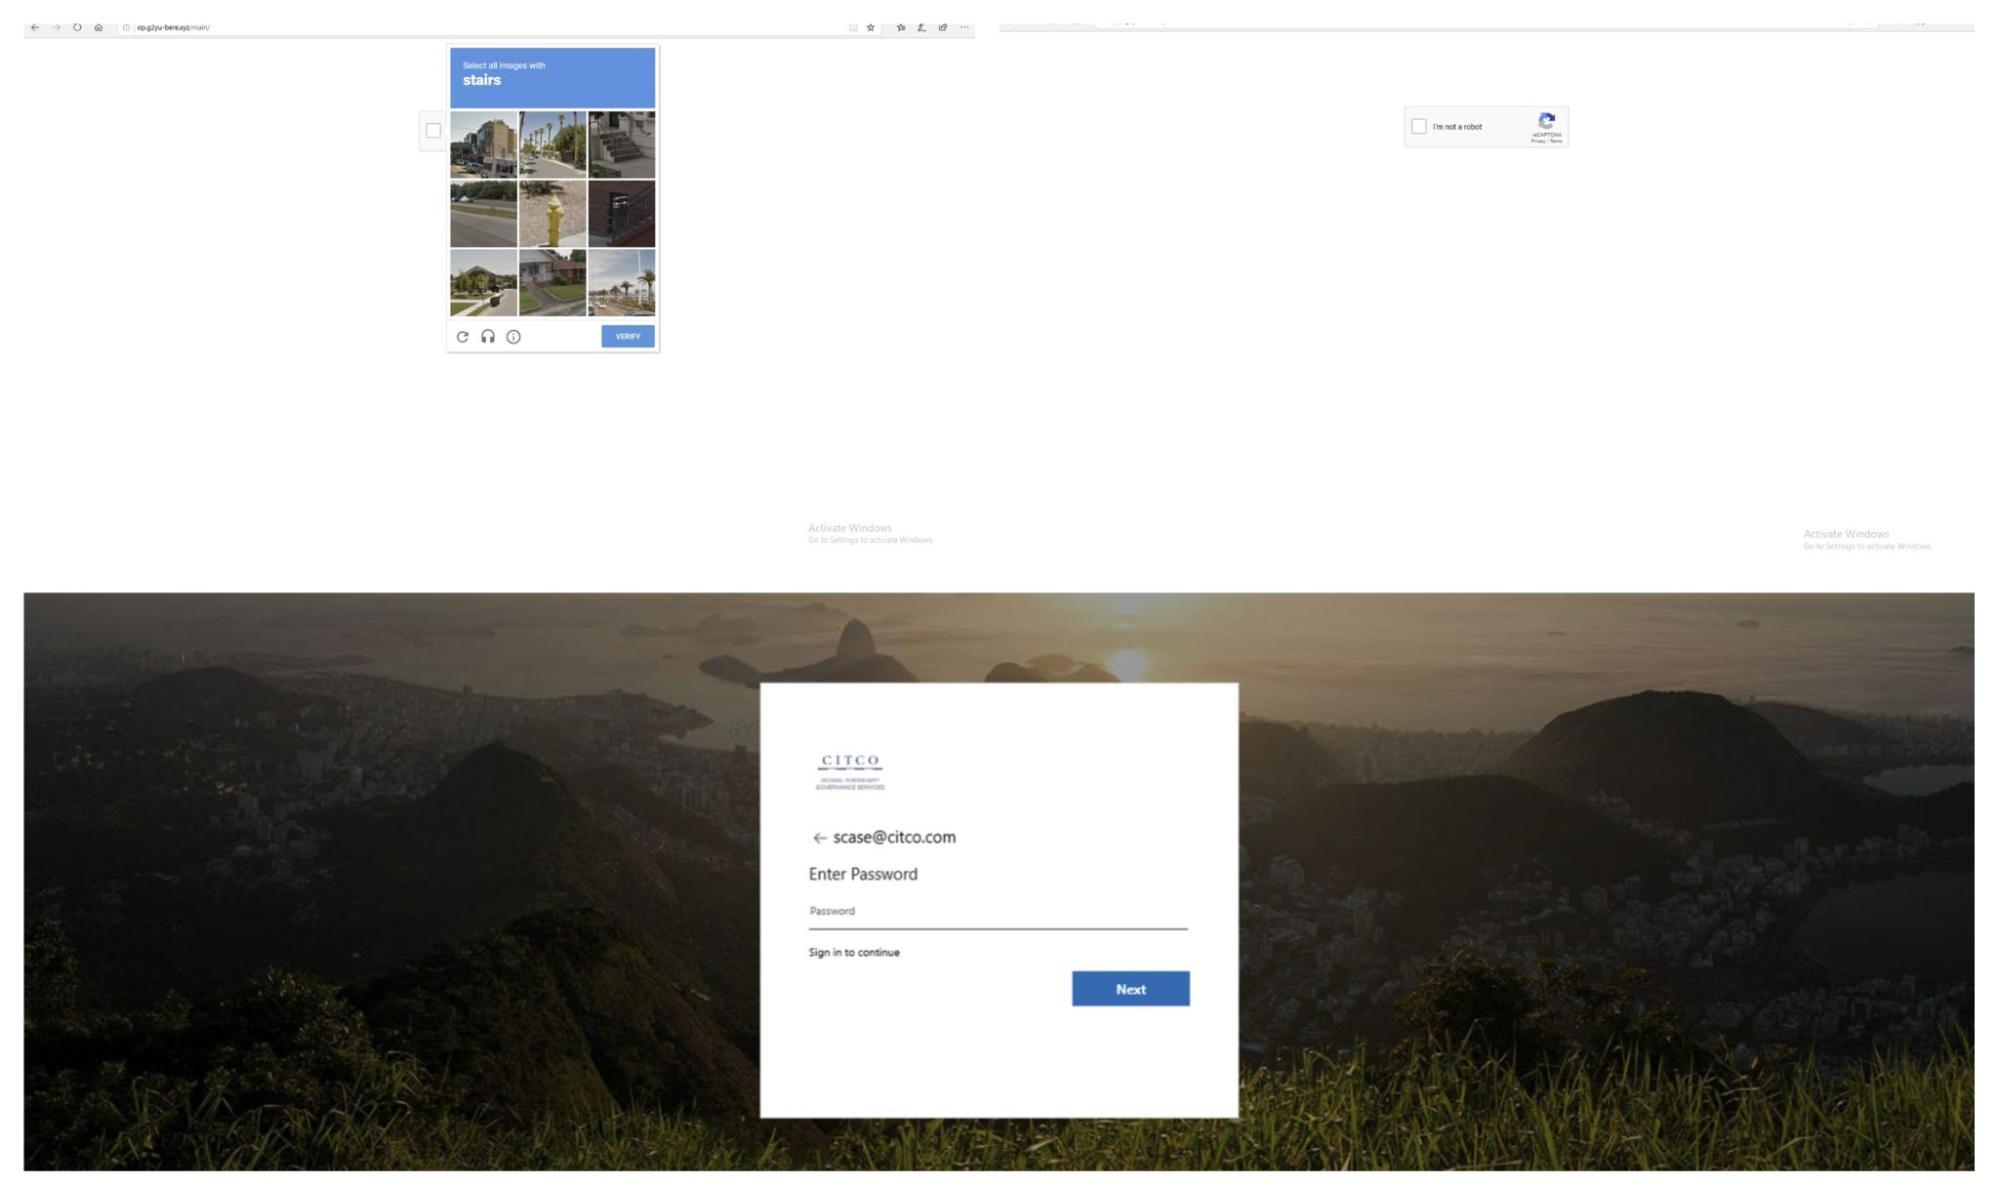 Screenshot of a CAPTCHA-protected phishing campaign seeking Microsoft account credentials.